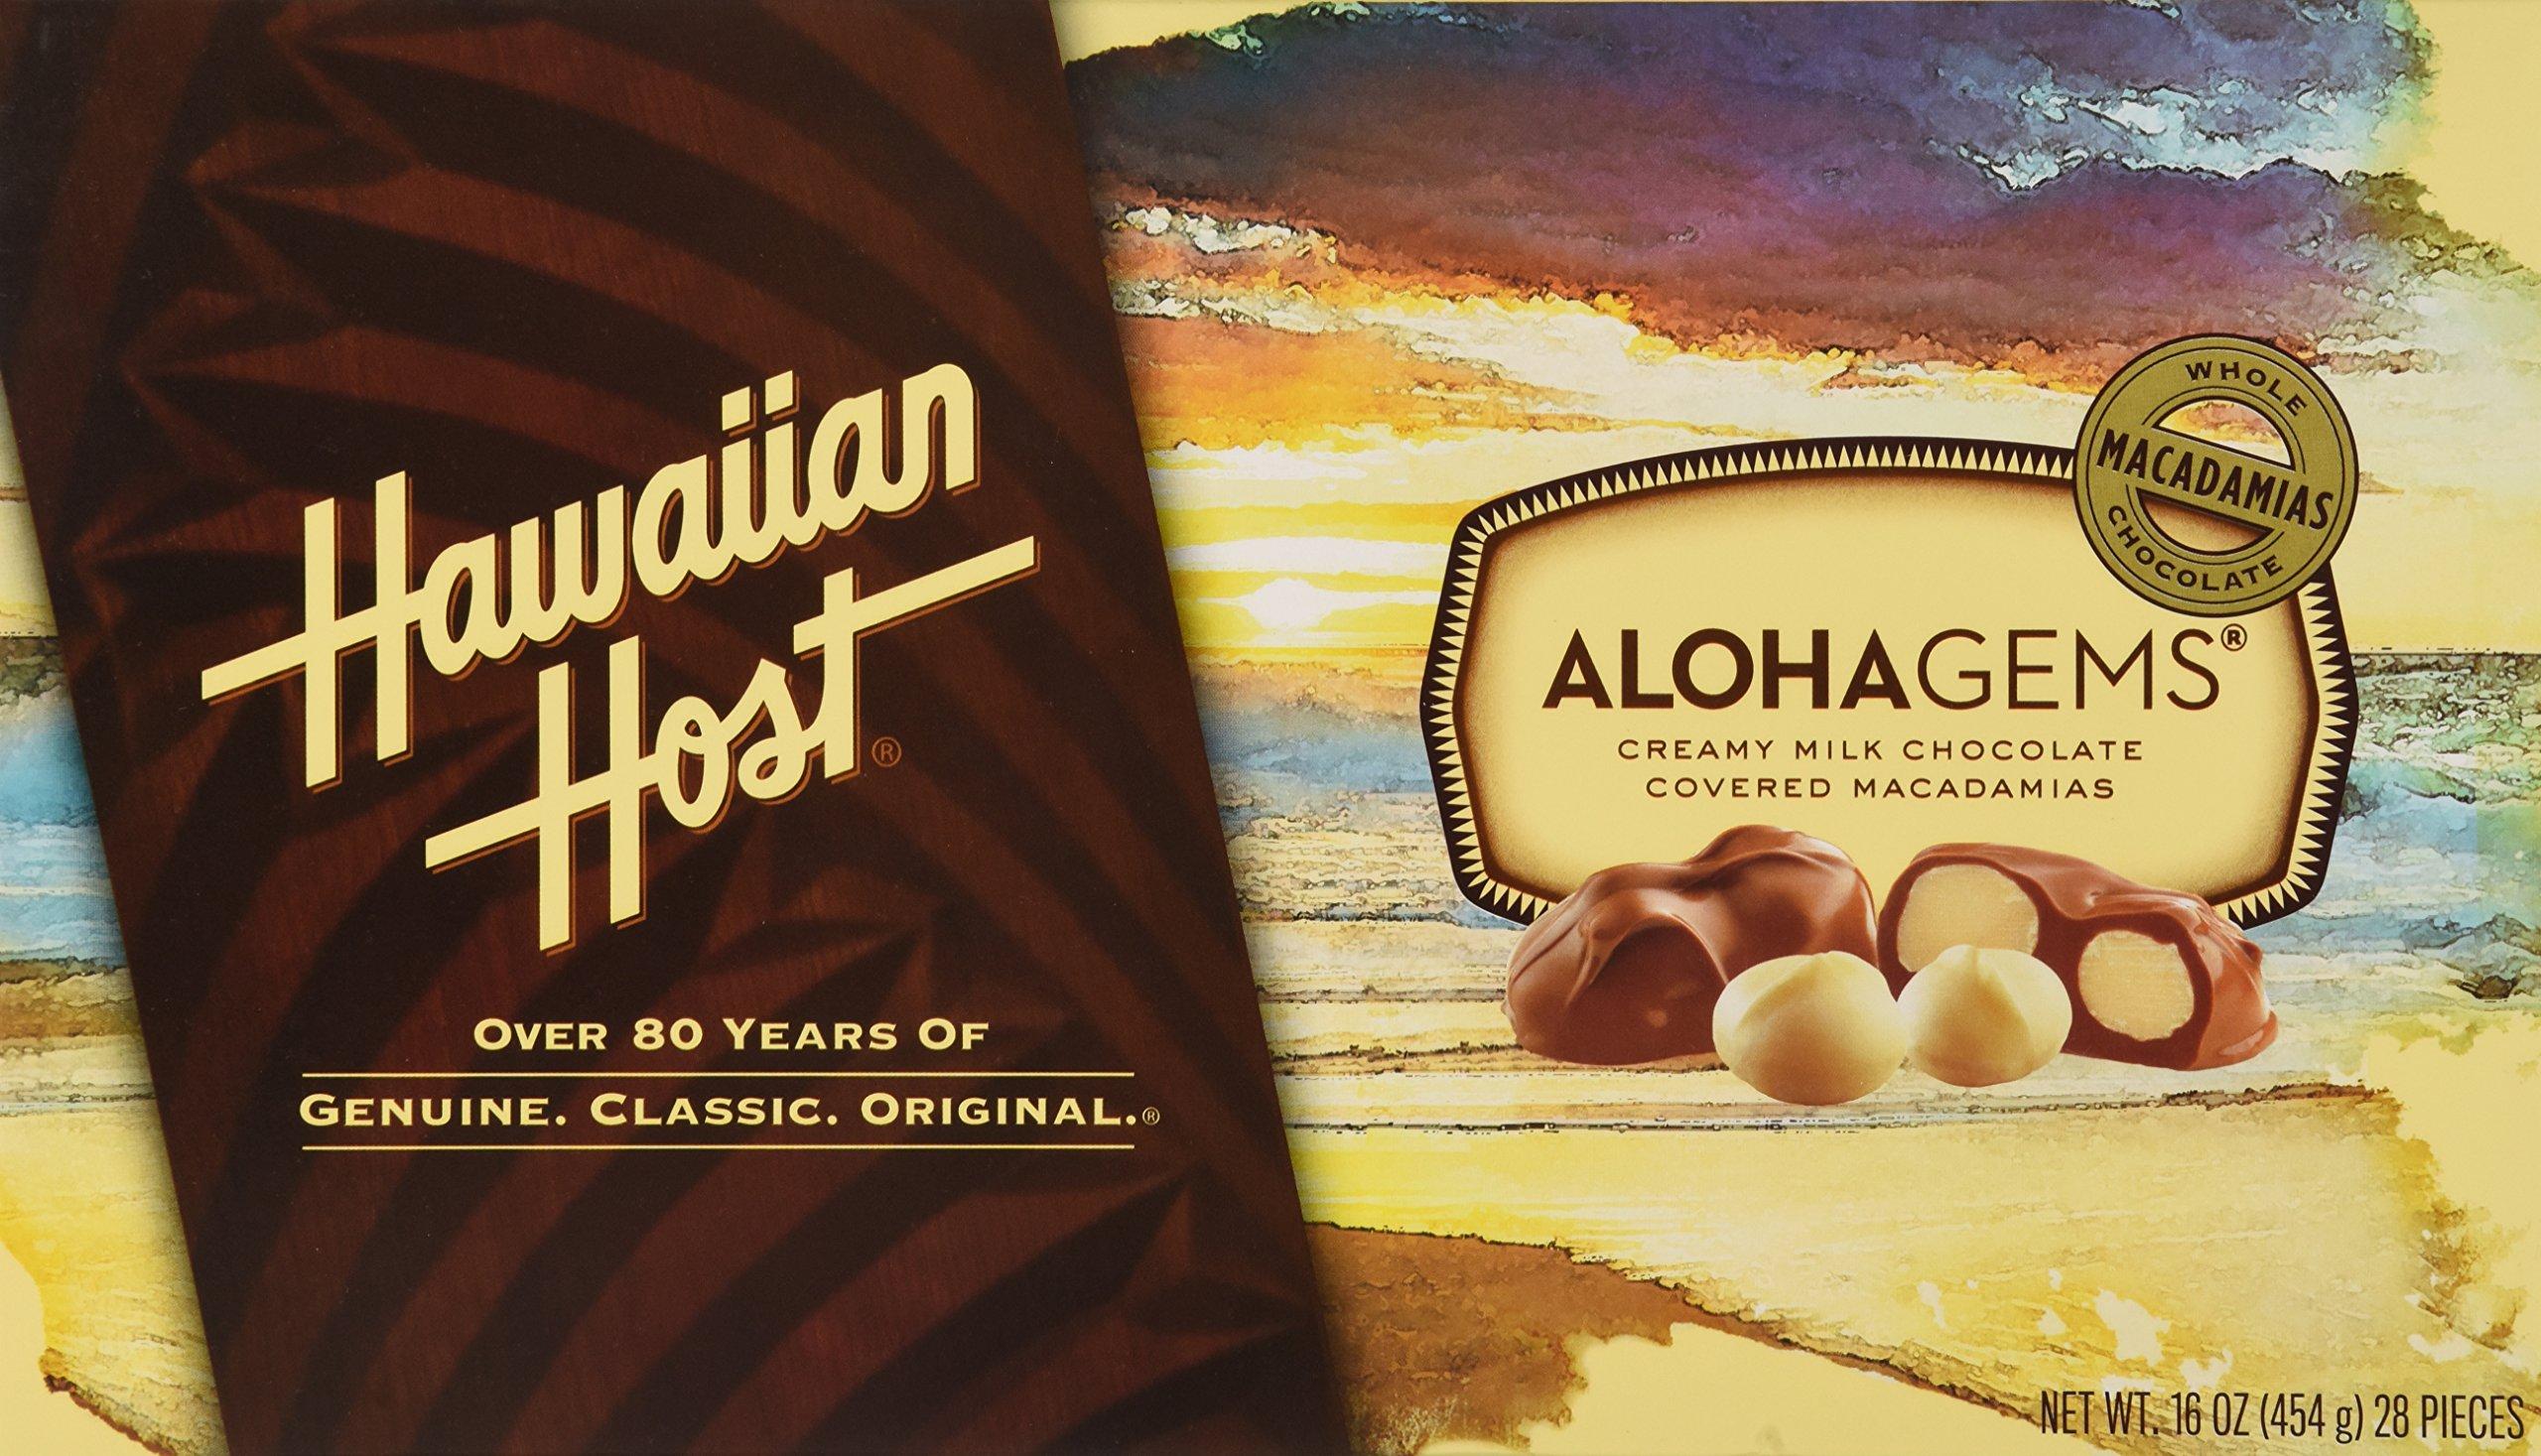 Hawaiian Host Aloha Gems Creamy Milk Chocolate Covered Macadamia Nuts, 16 oz. (2 Pack)